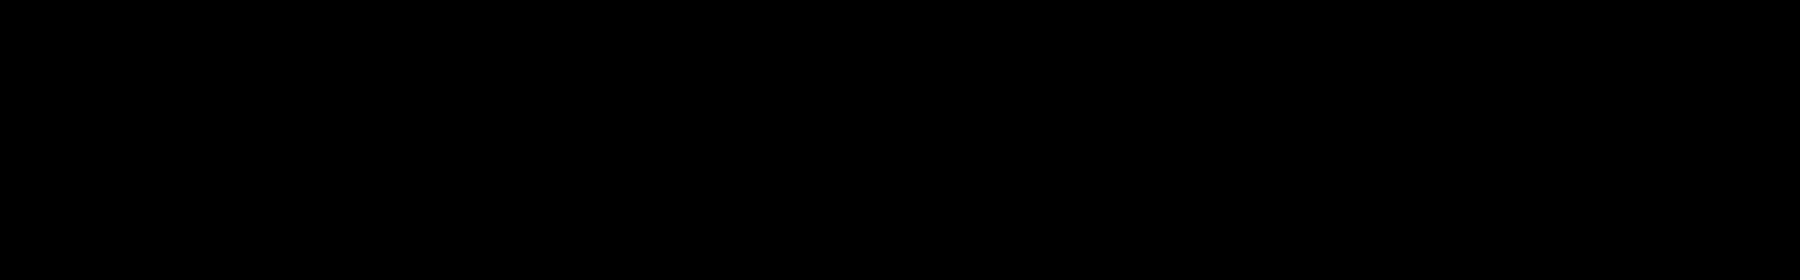 Rockstar 4 audio waveform